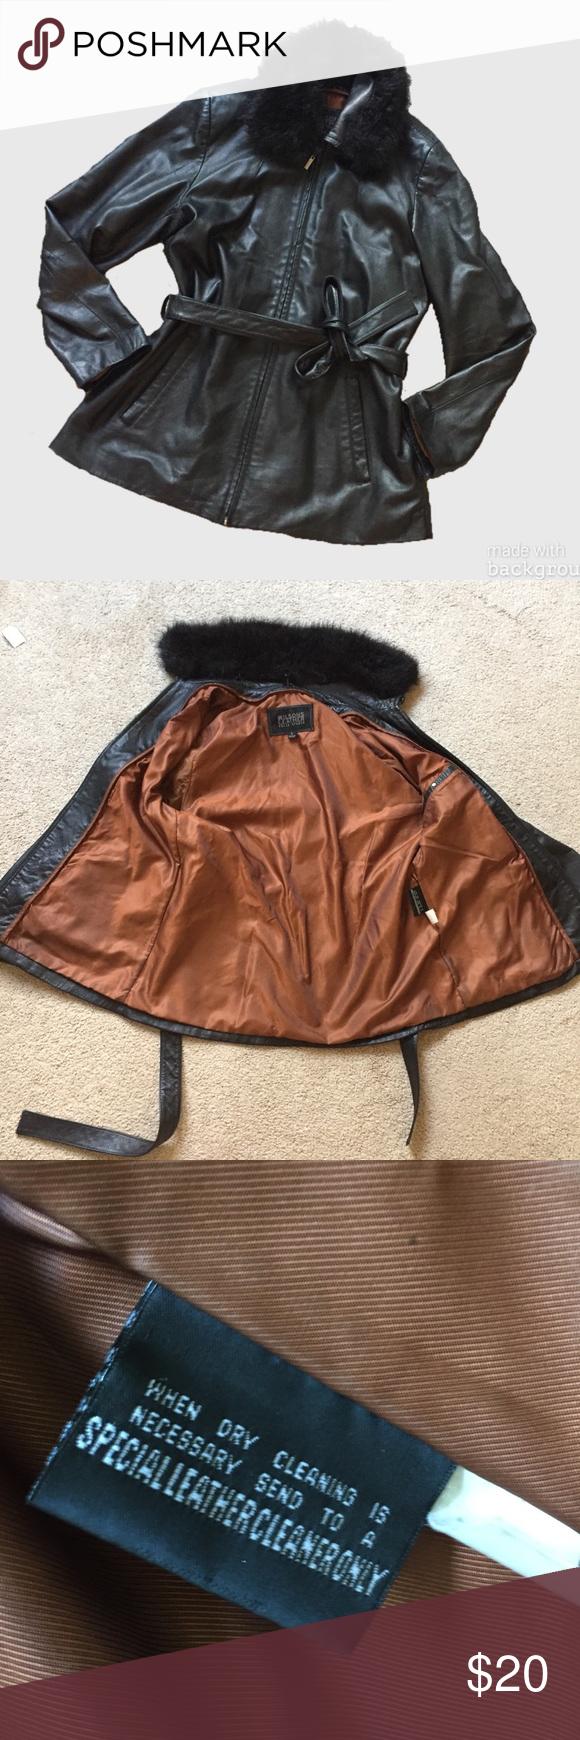 Wilsons Leather Pelle Studio Jacket Size L Wilsons